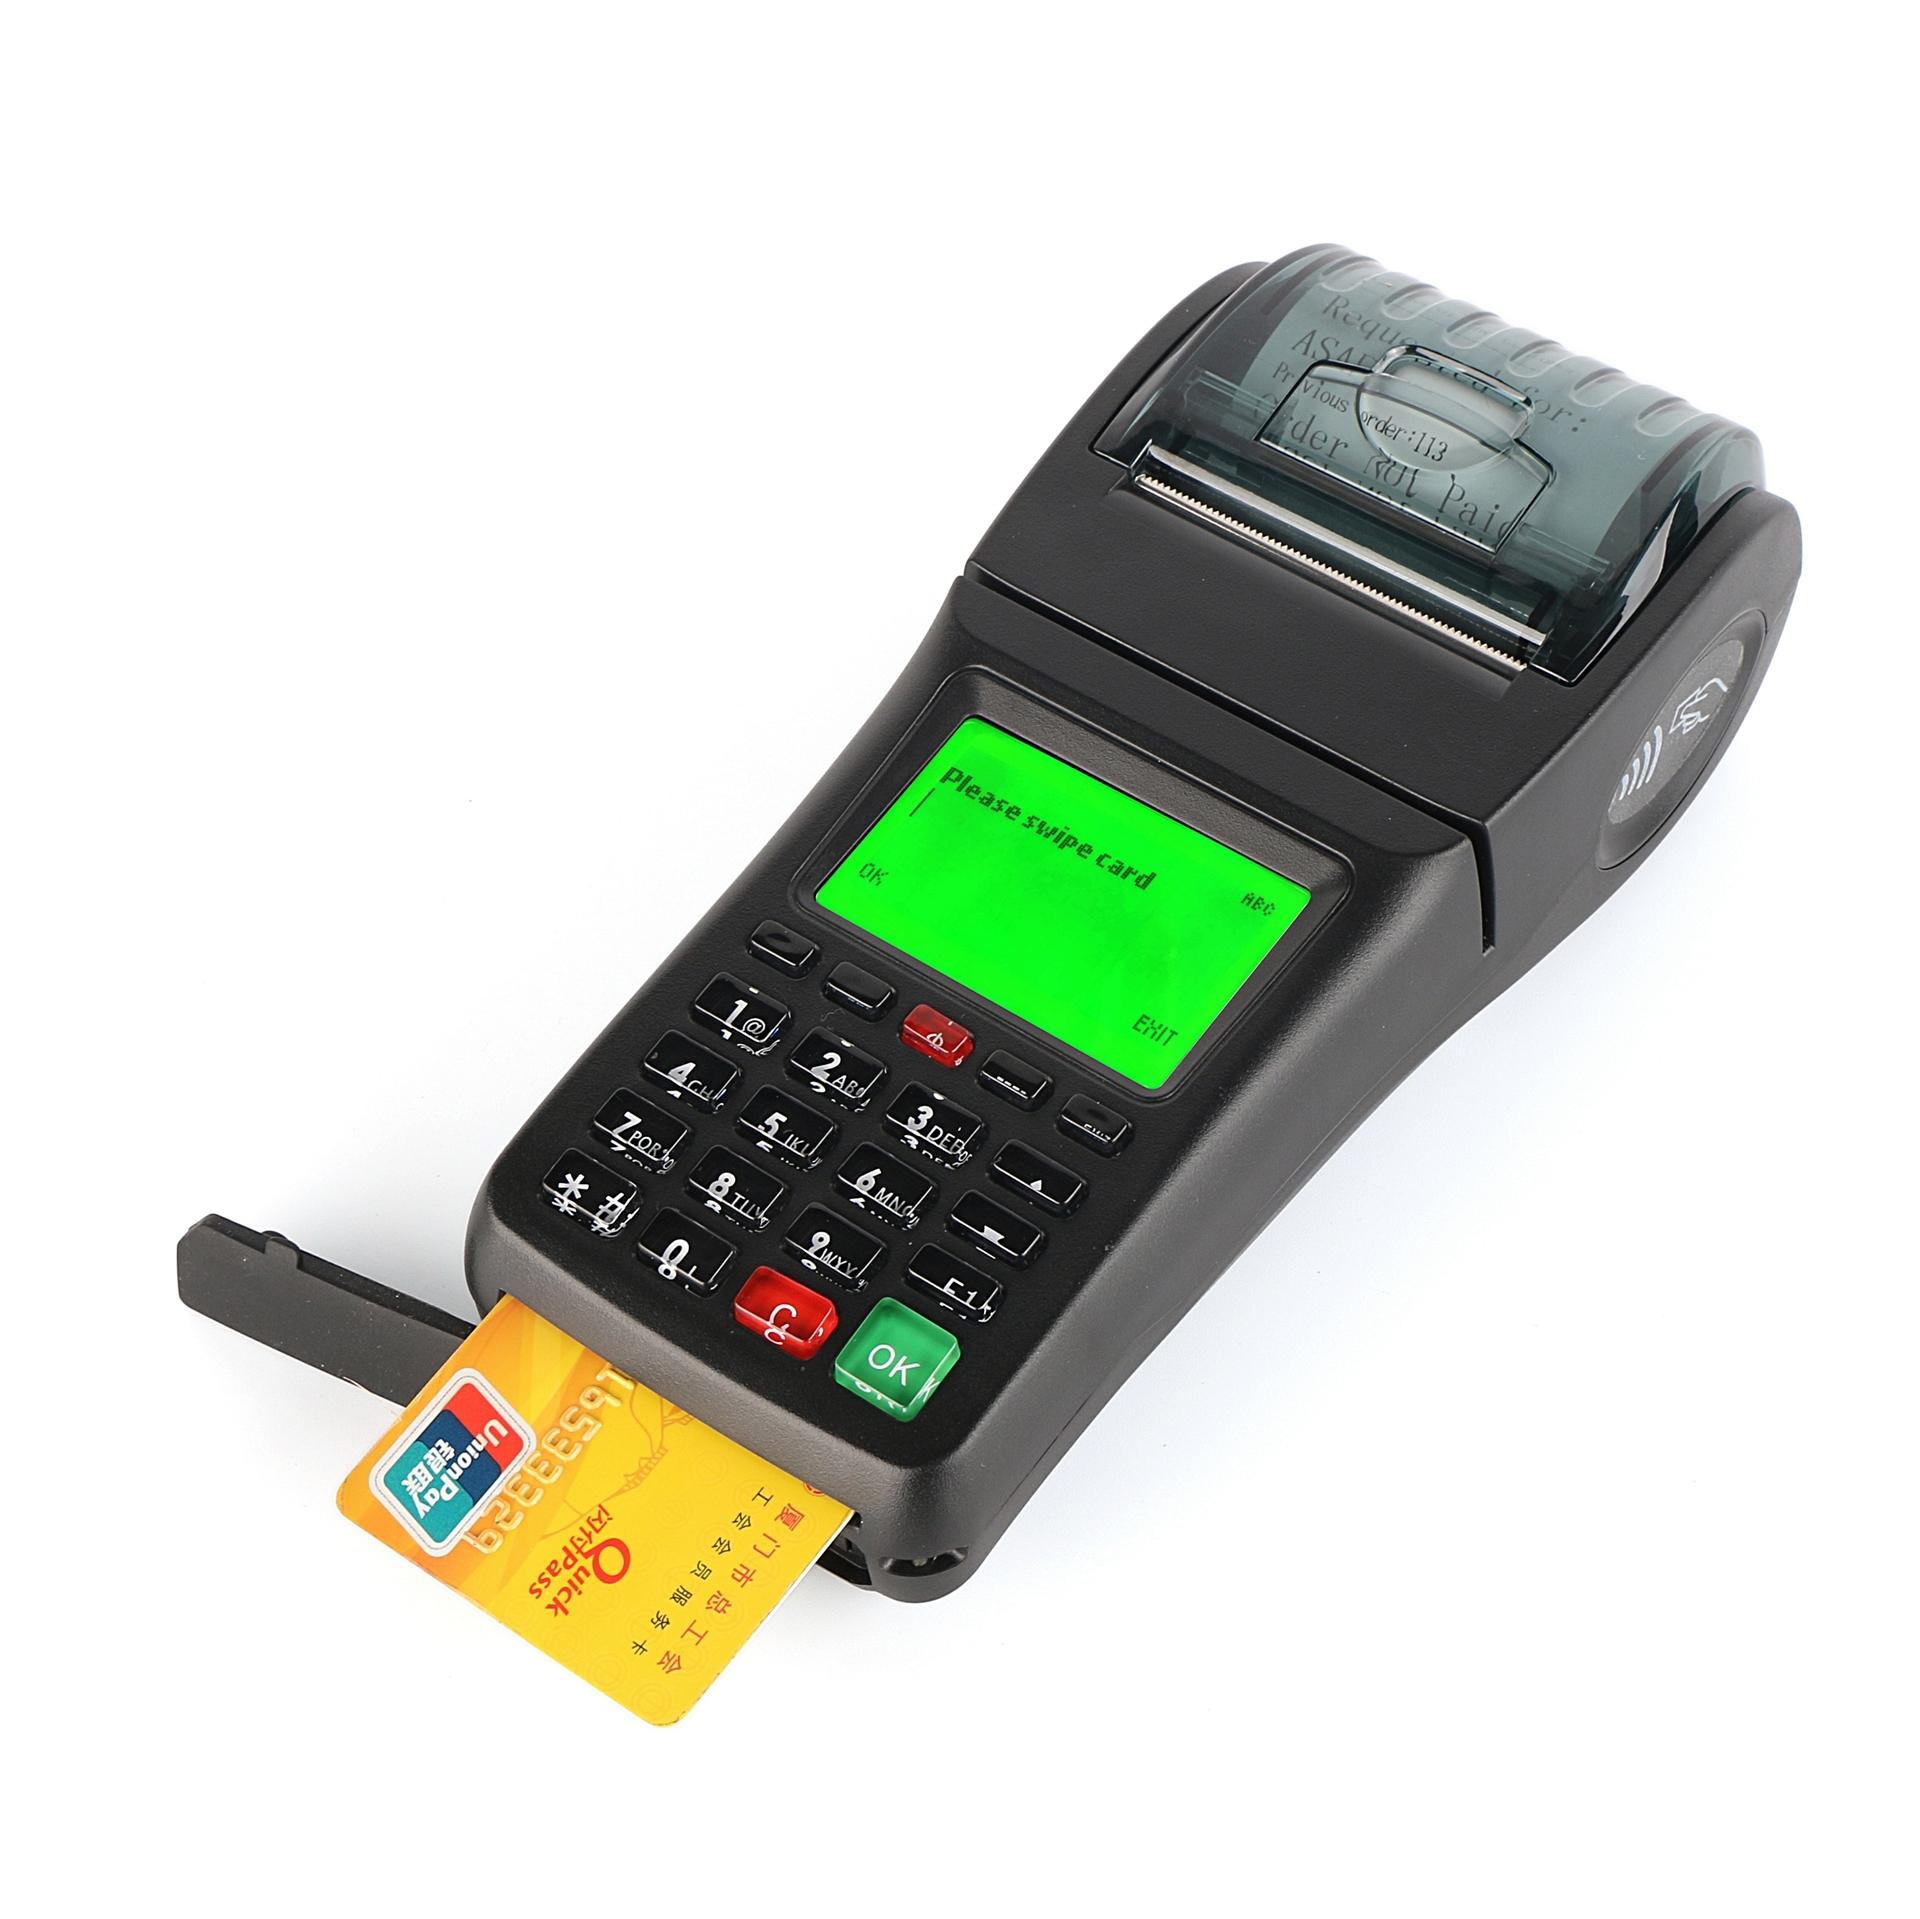 Handheld NFC, RFID, Smart Card, Magnetic Card Reader POS Ticket Terminal